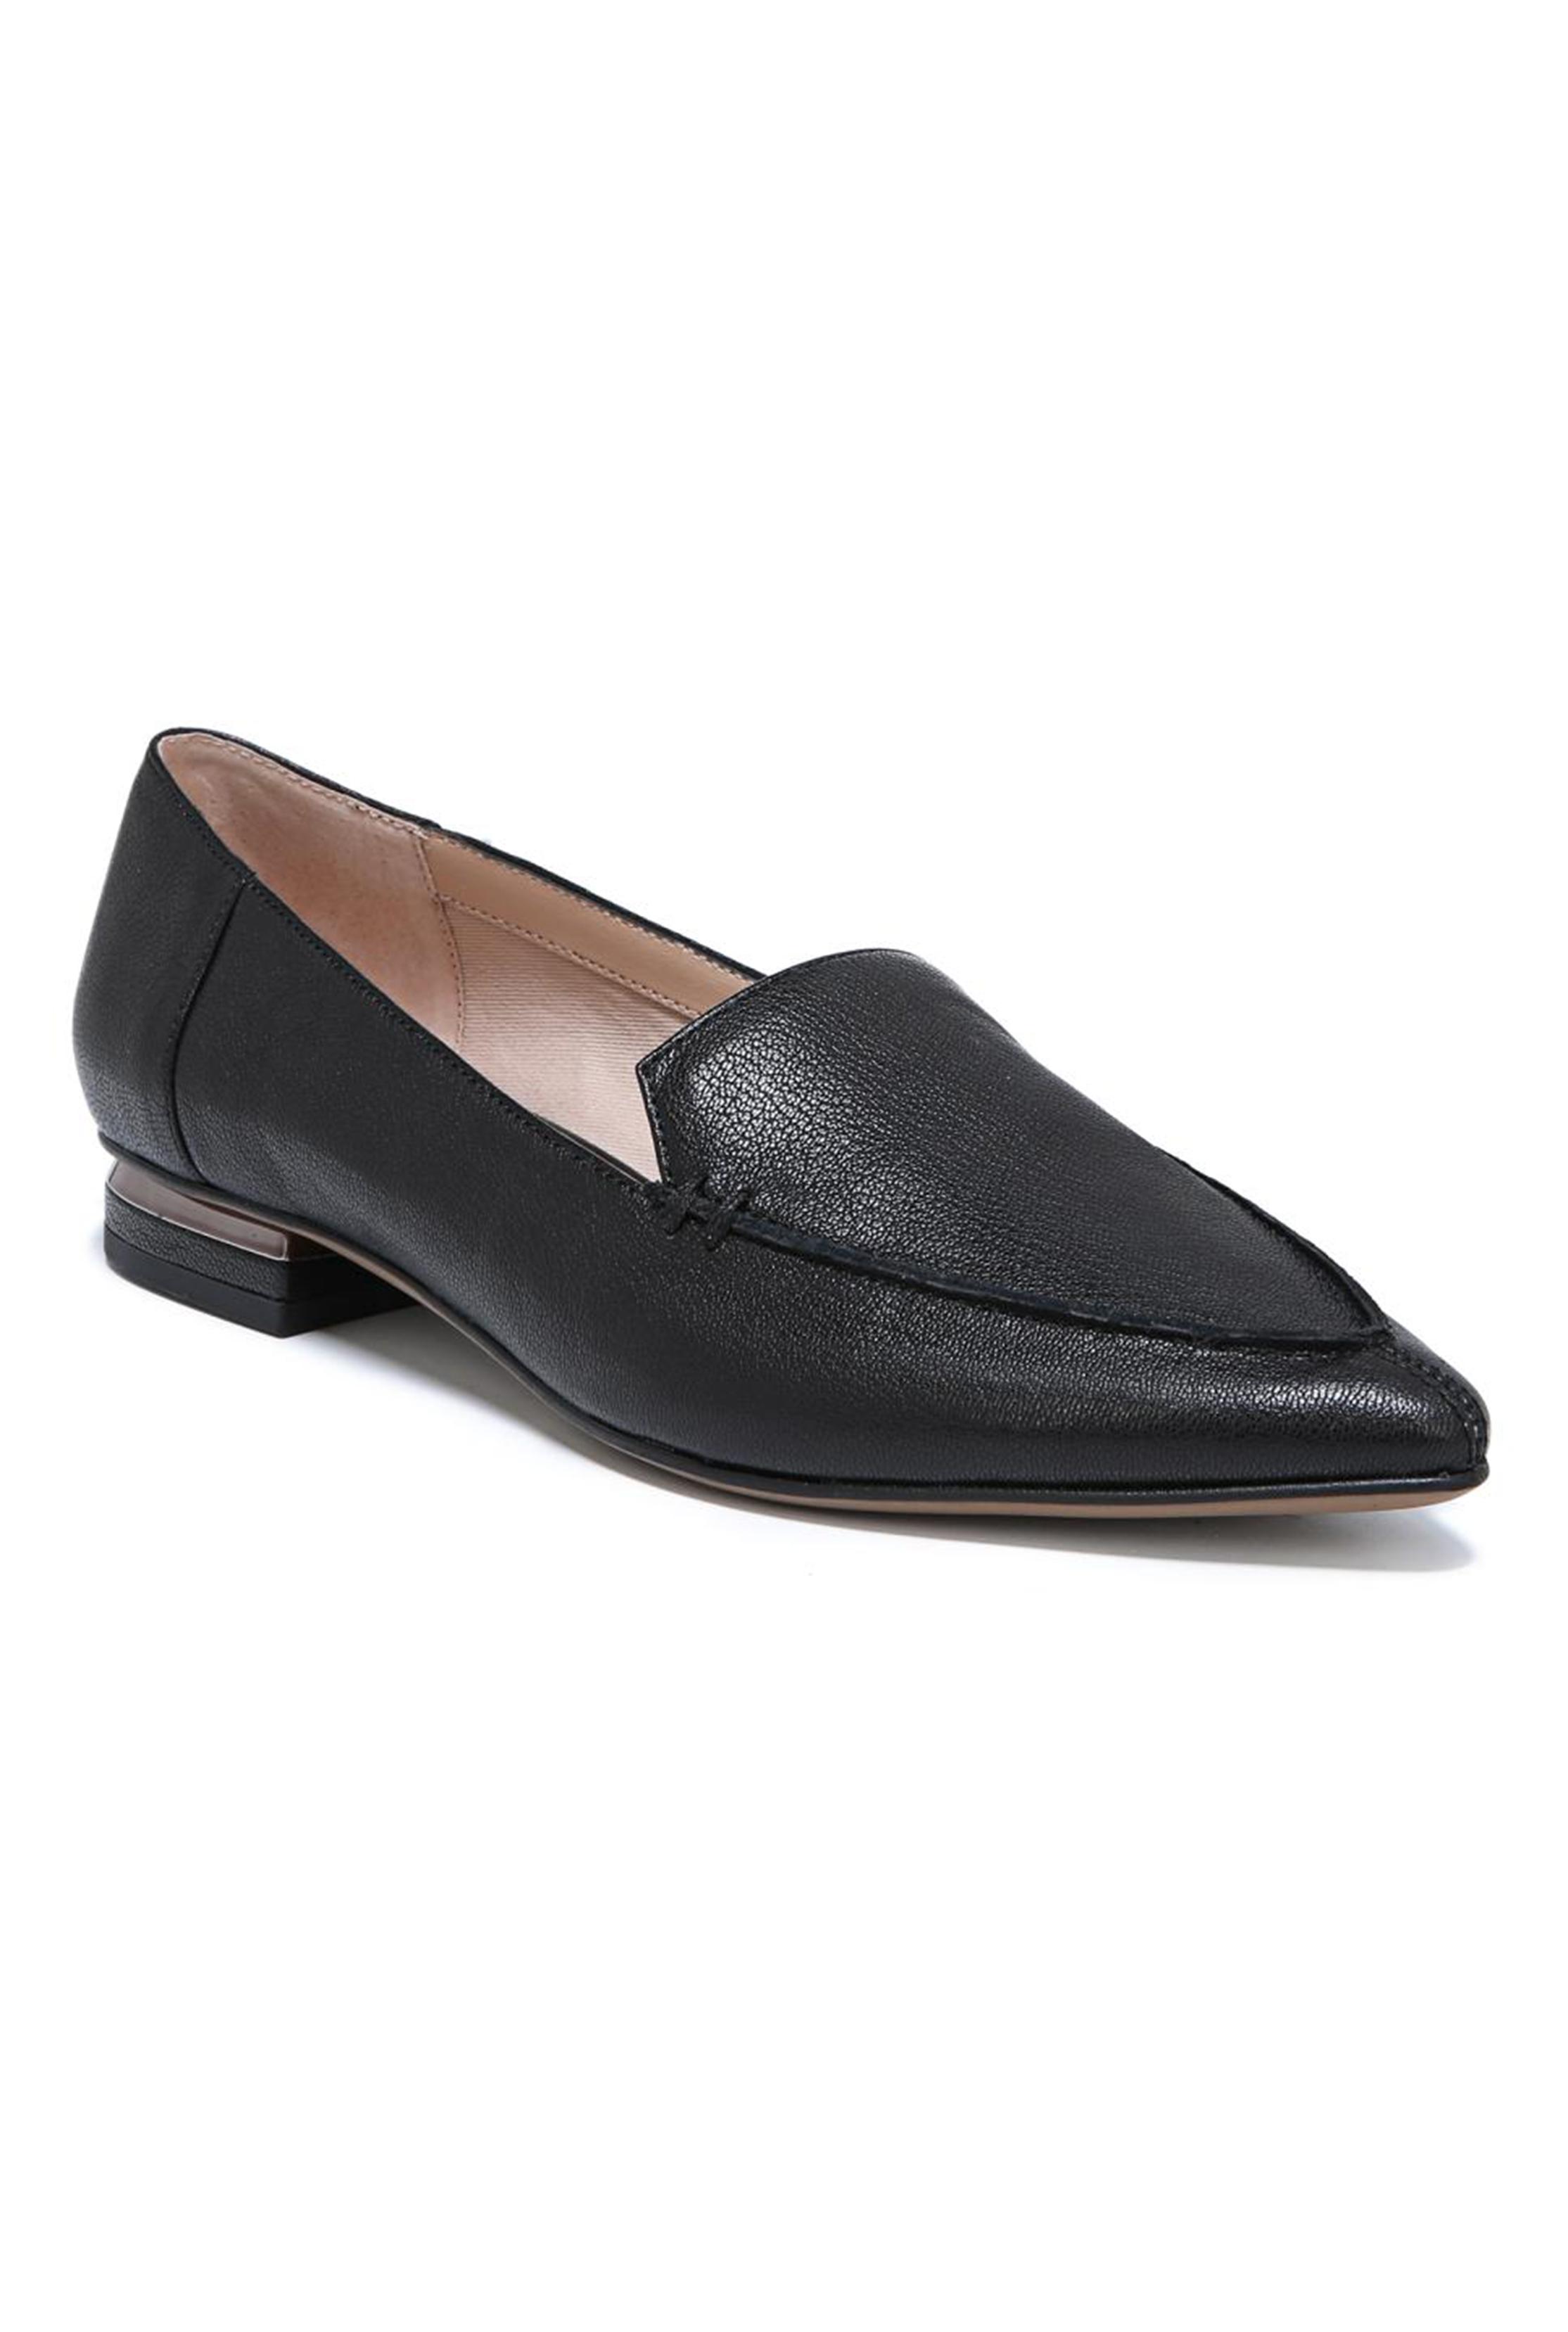 FRANCO SARTO Black Starland Flat Shoe